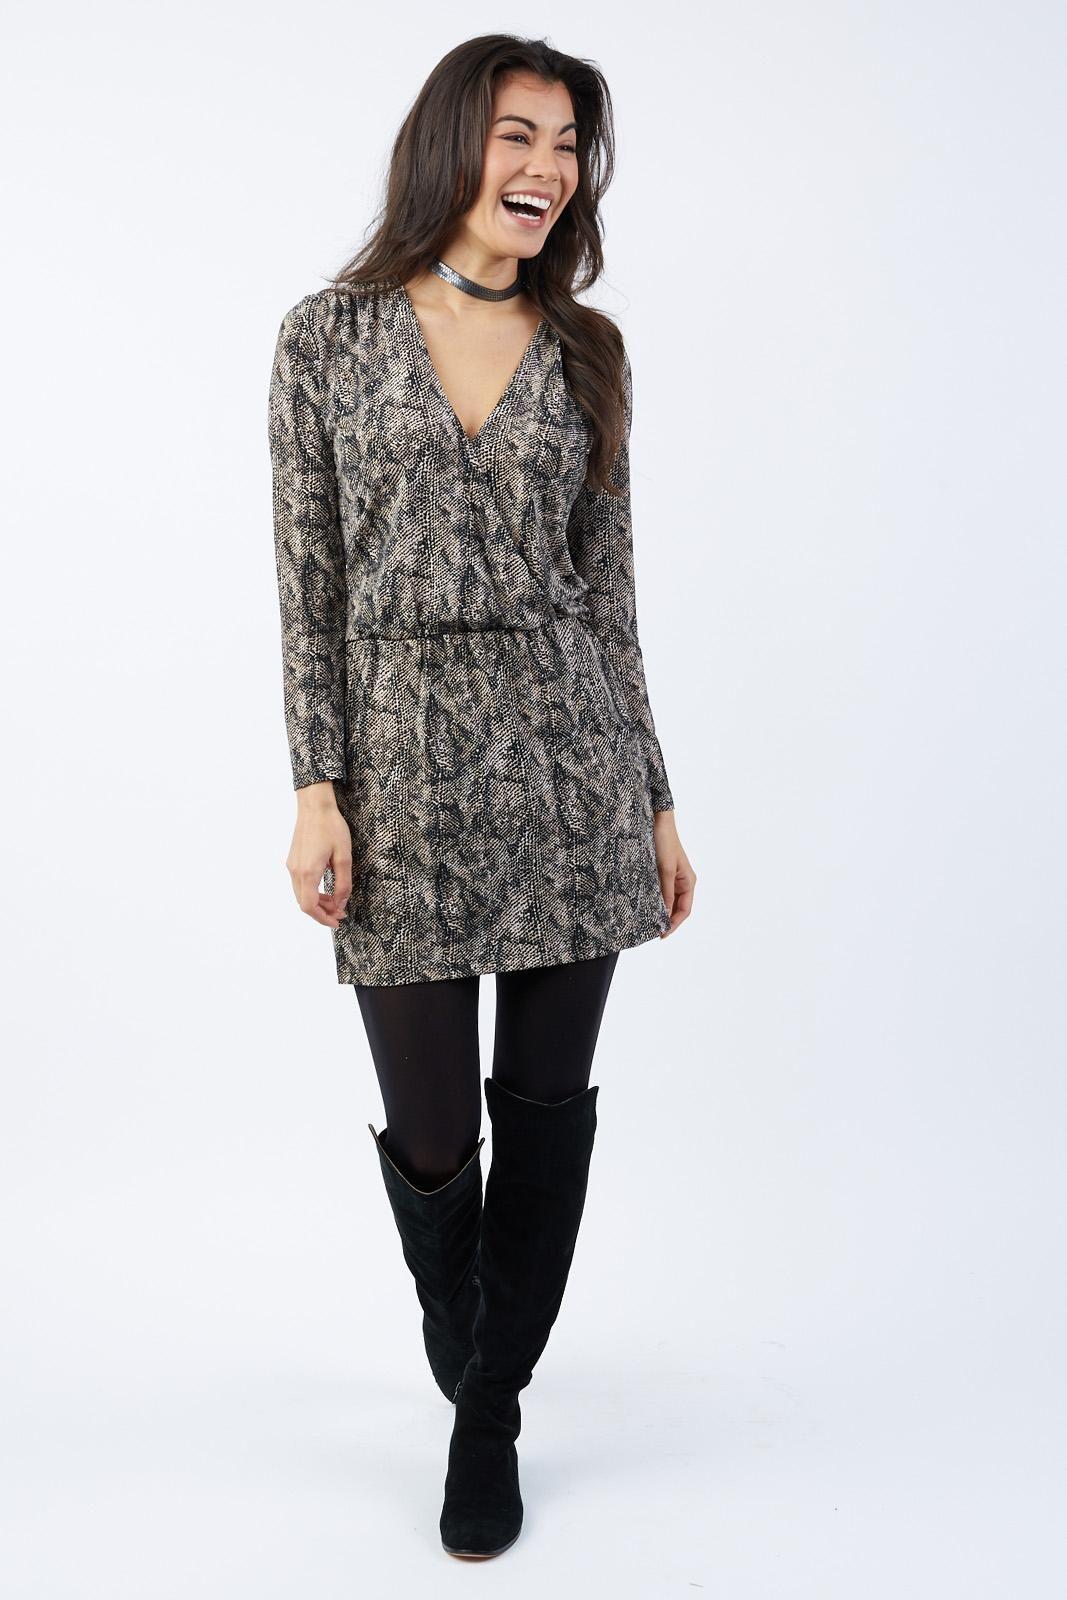 Lizzy Cinch Waist Dress by ALLISON JOY - EVEREVE